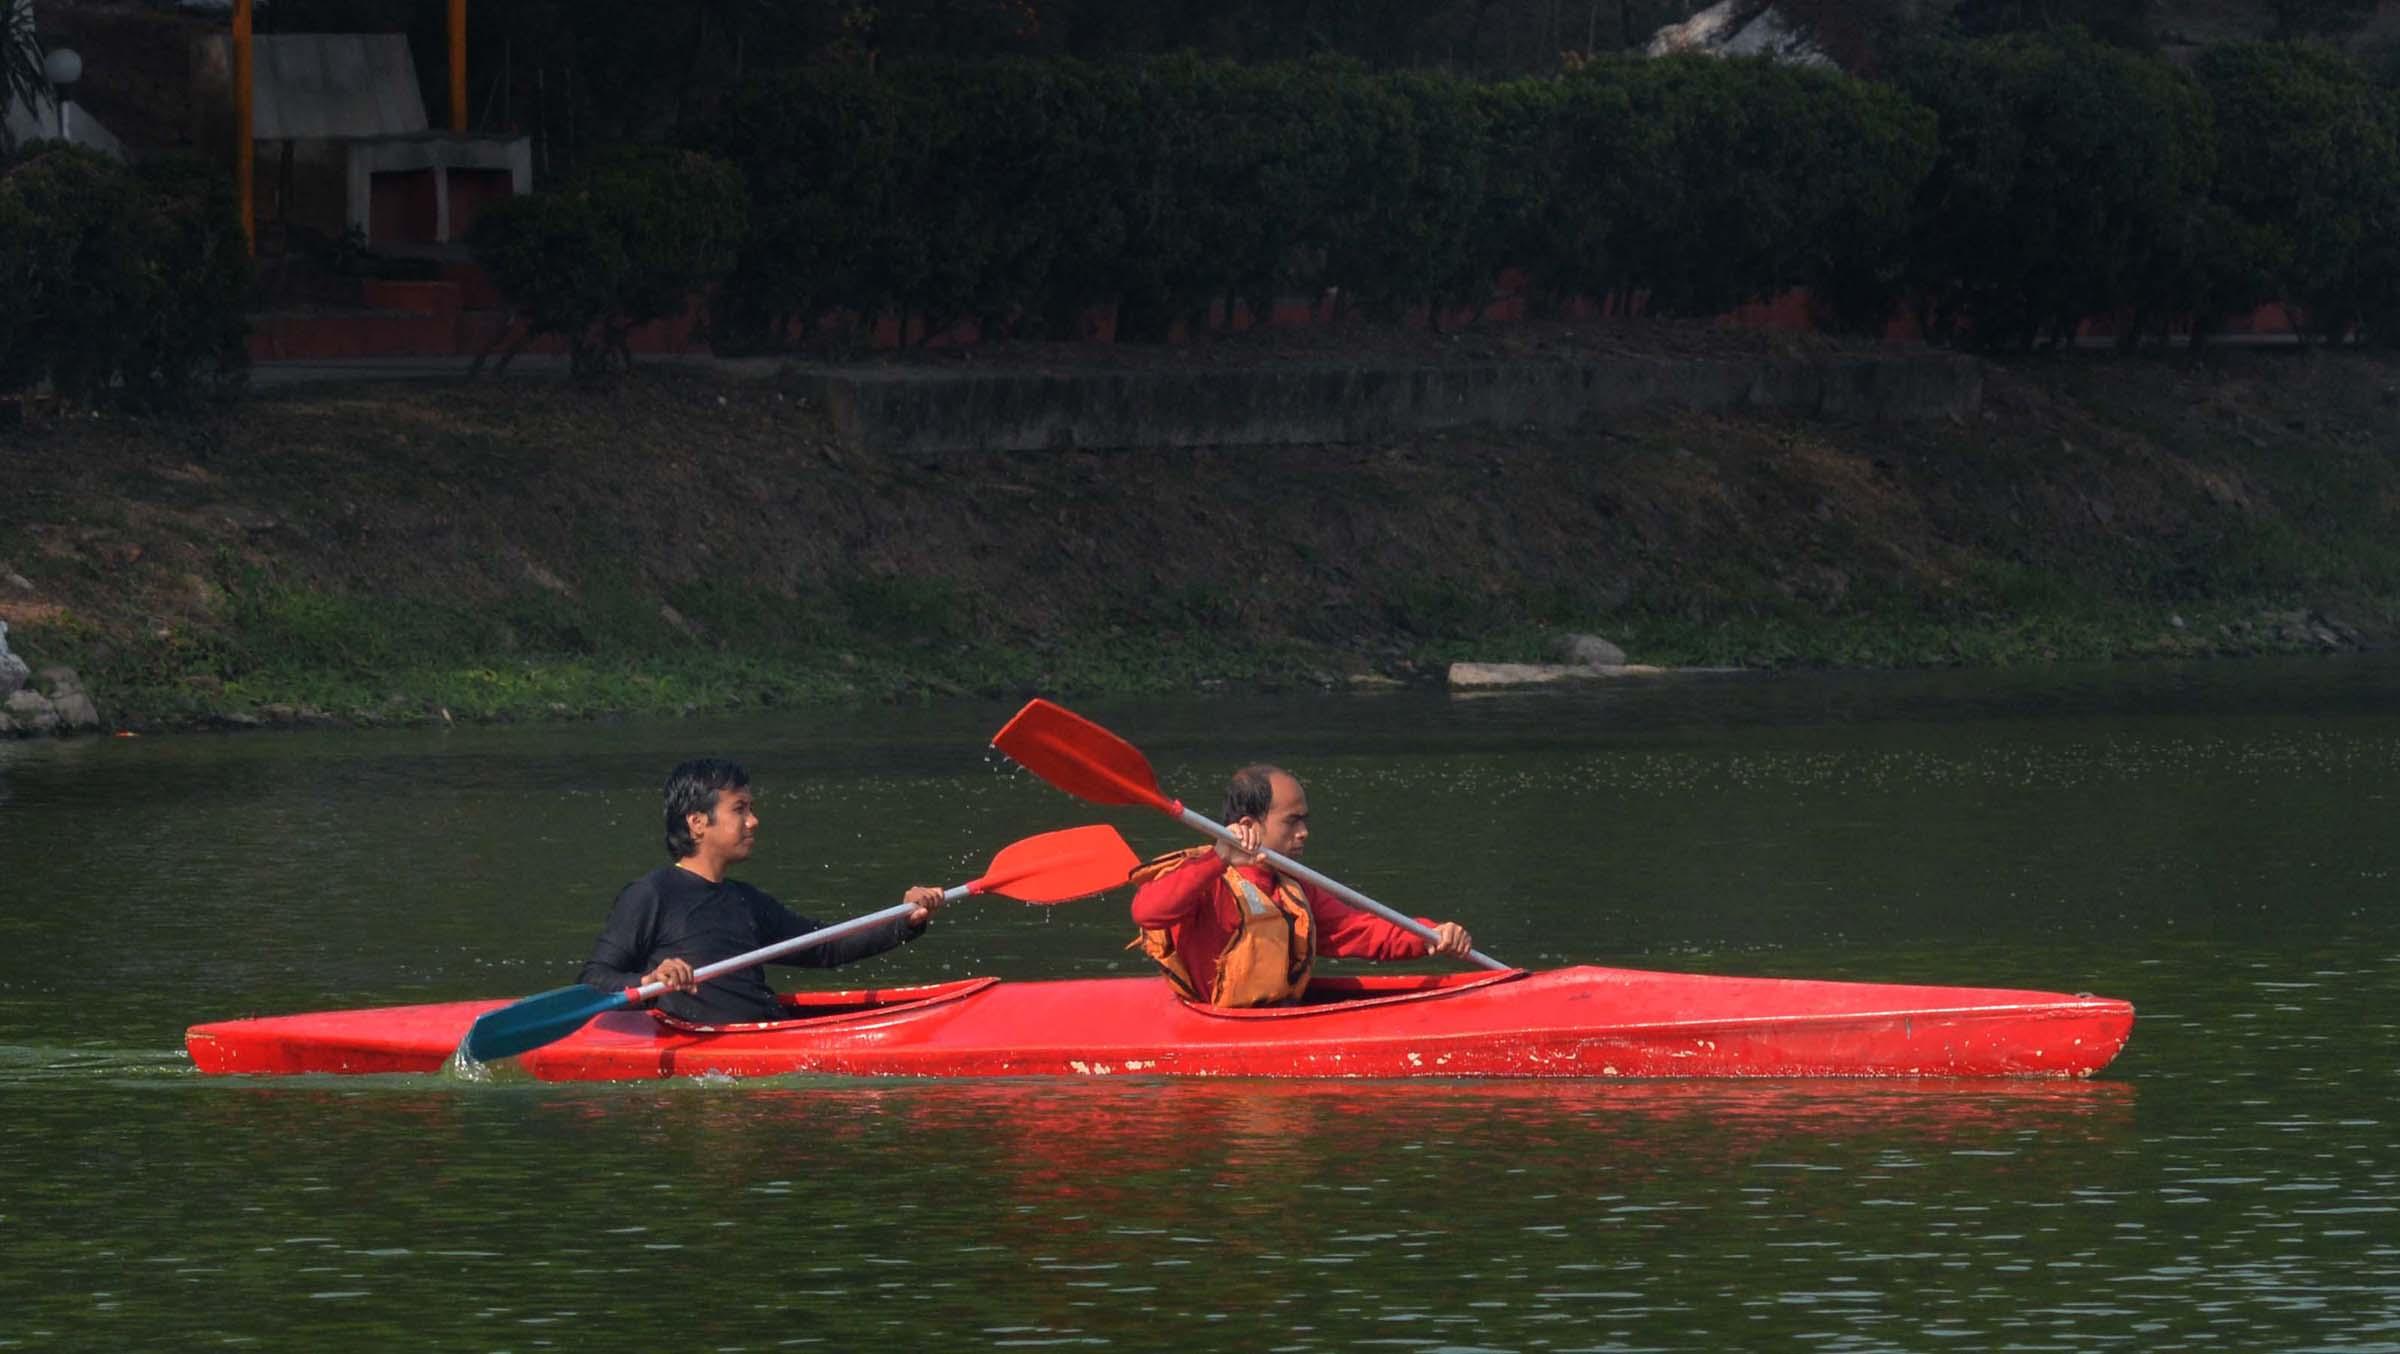 kayaking event